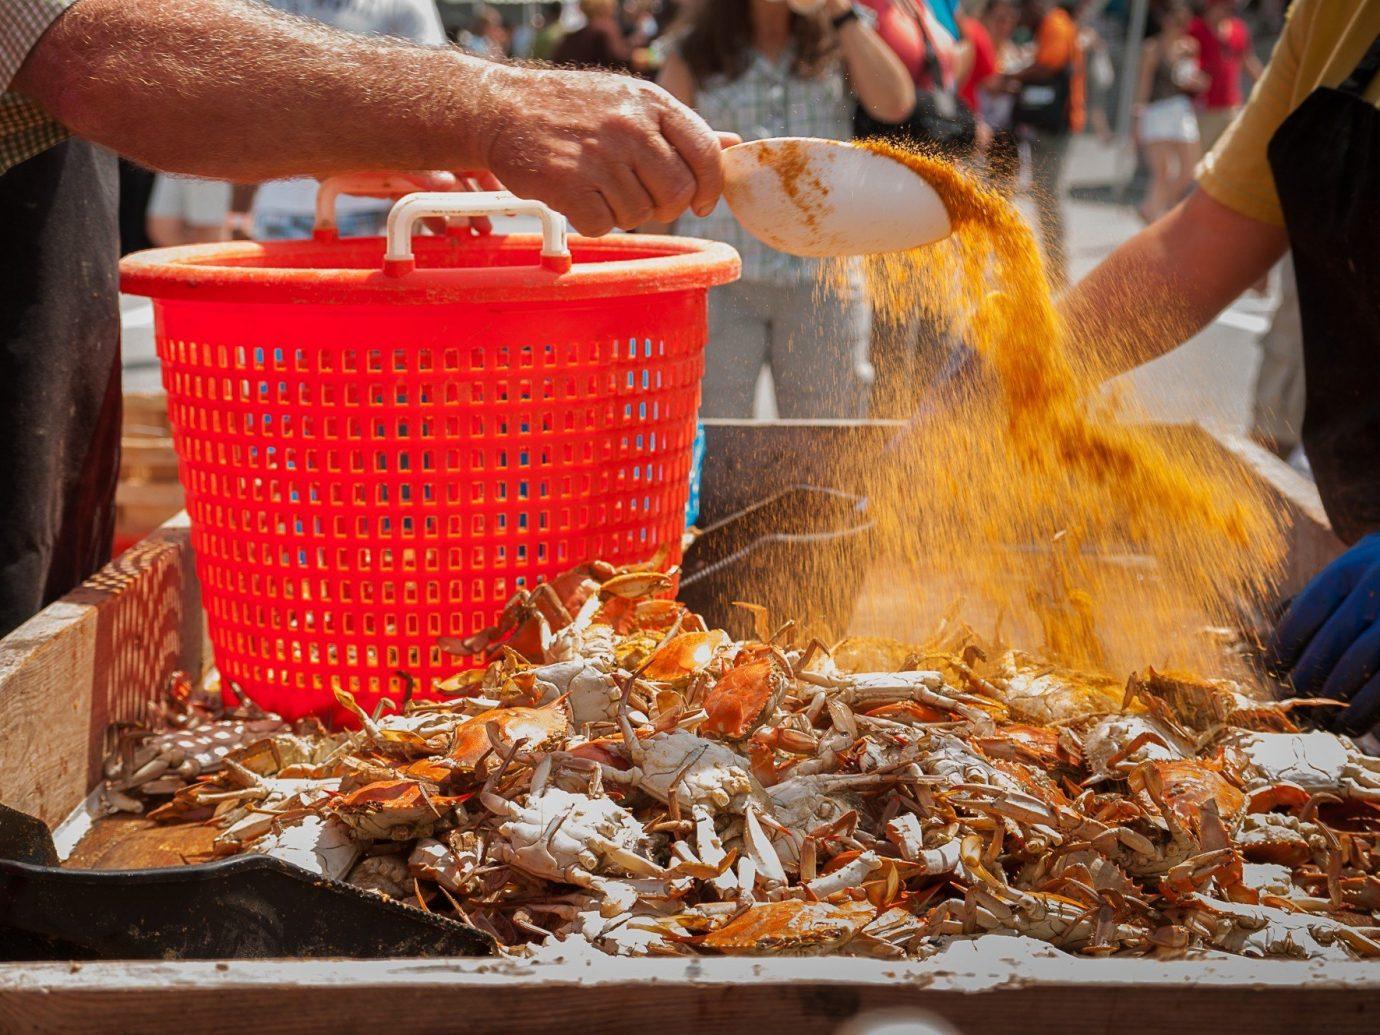 Trip Ideas person food dish market street food cuisine Seafood asian food meal